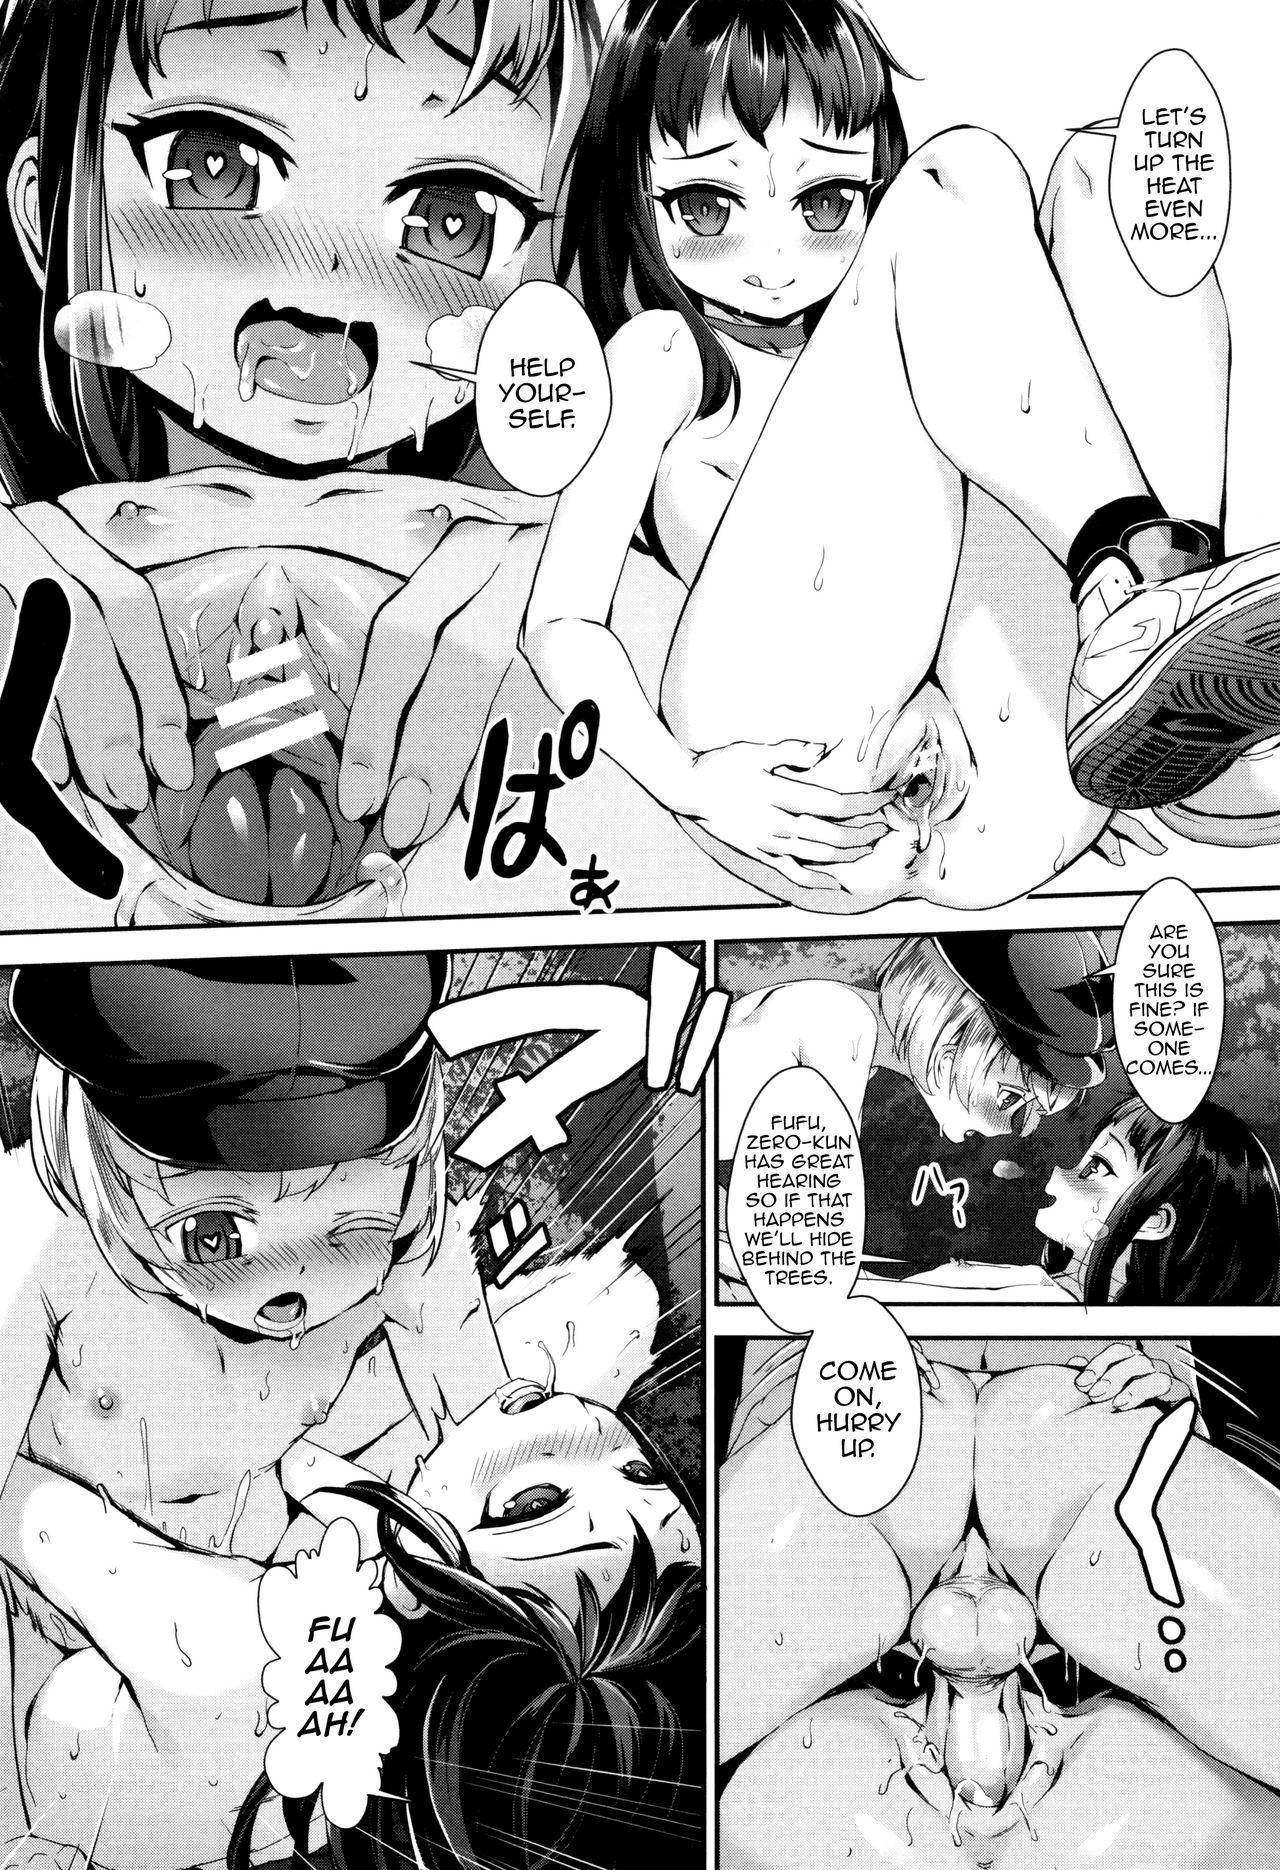 [Jairou] Erotic Training! ~Pakopako Rankou Seikyouiku~ Ch. 1-2 [English] [MrBubbles] 67